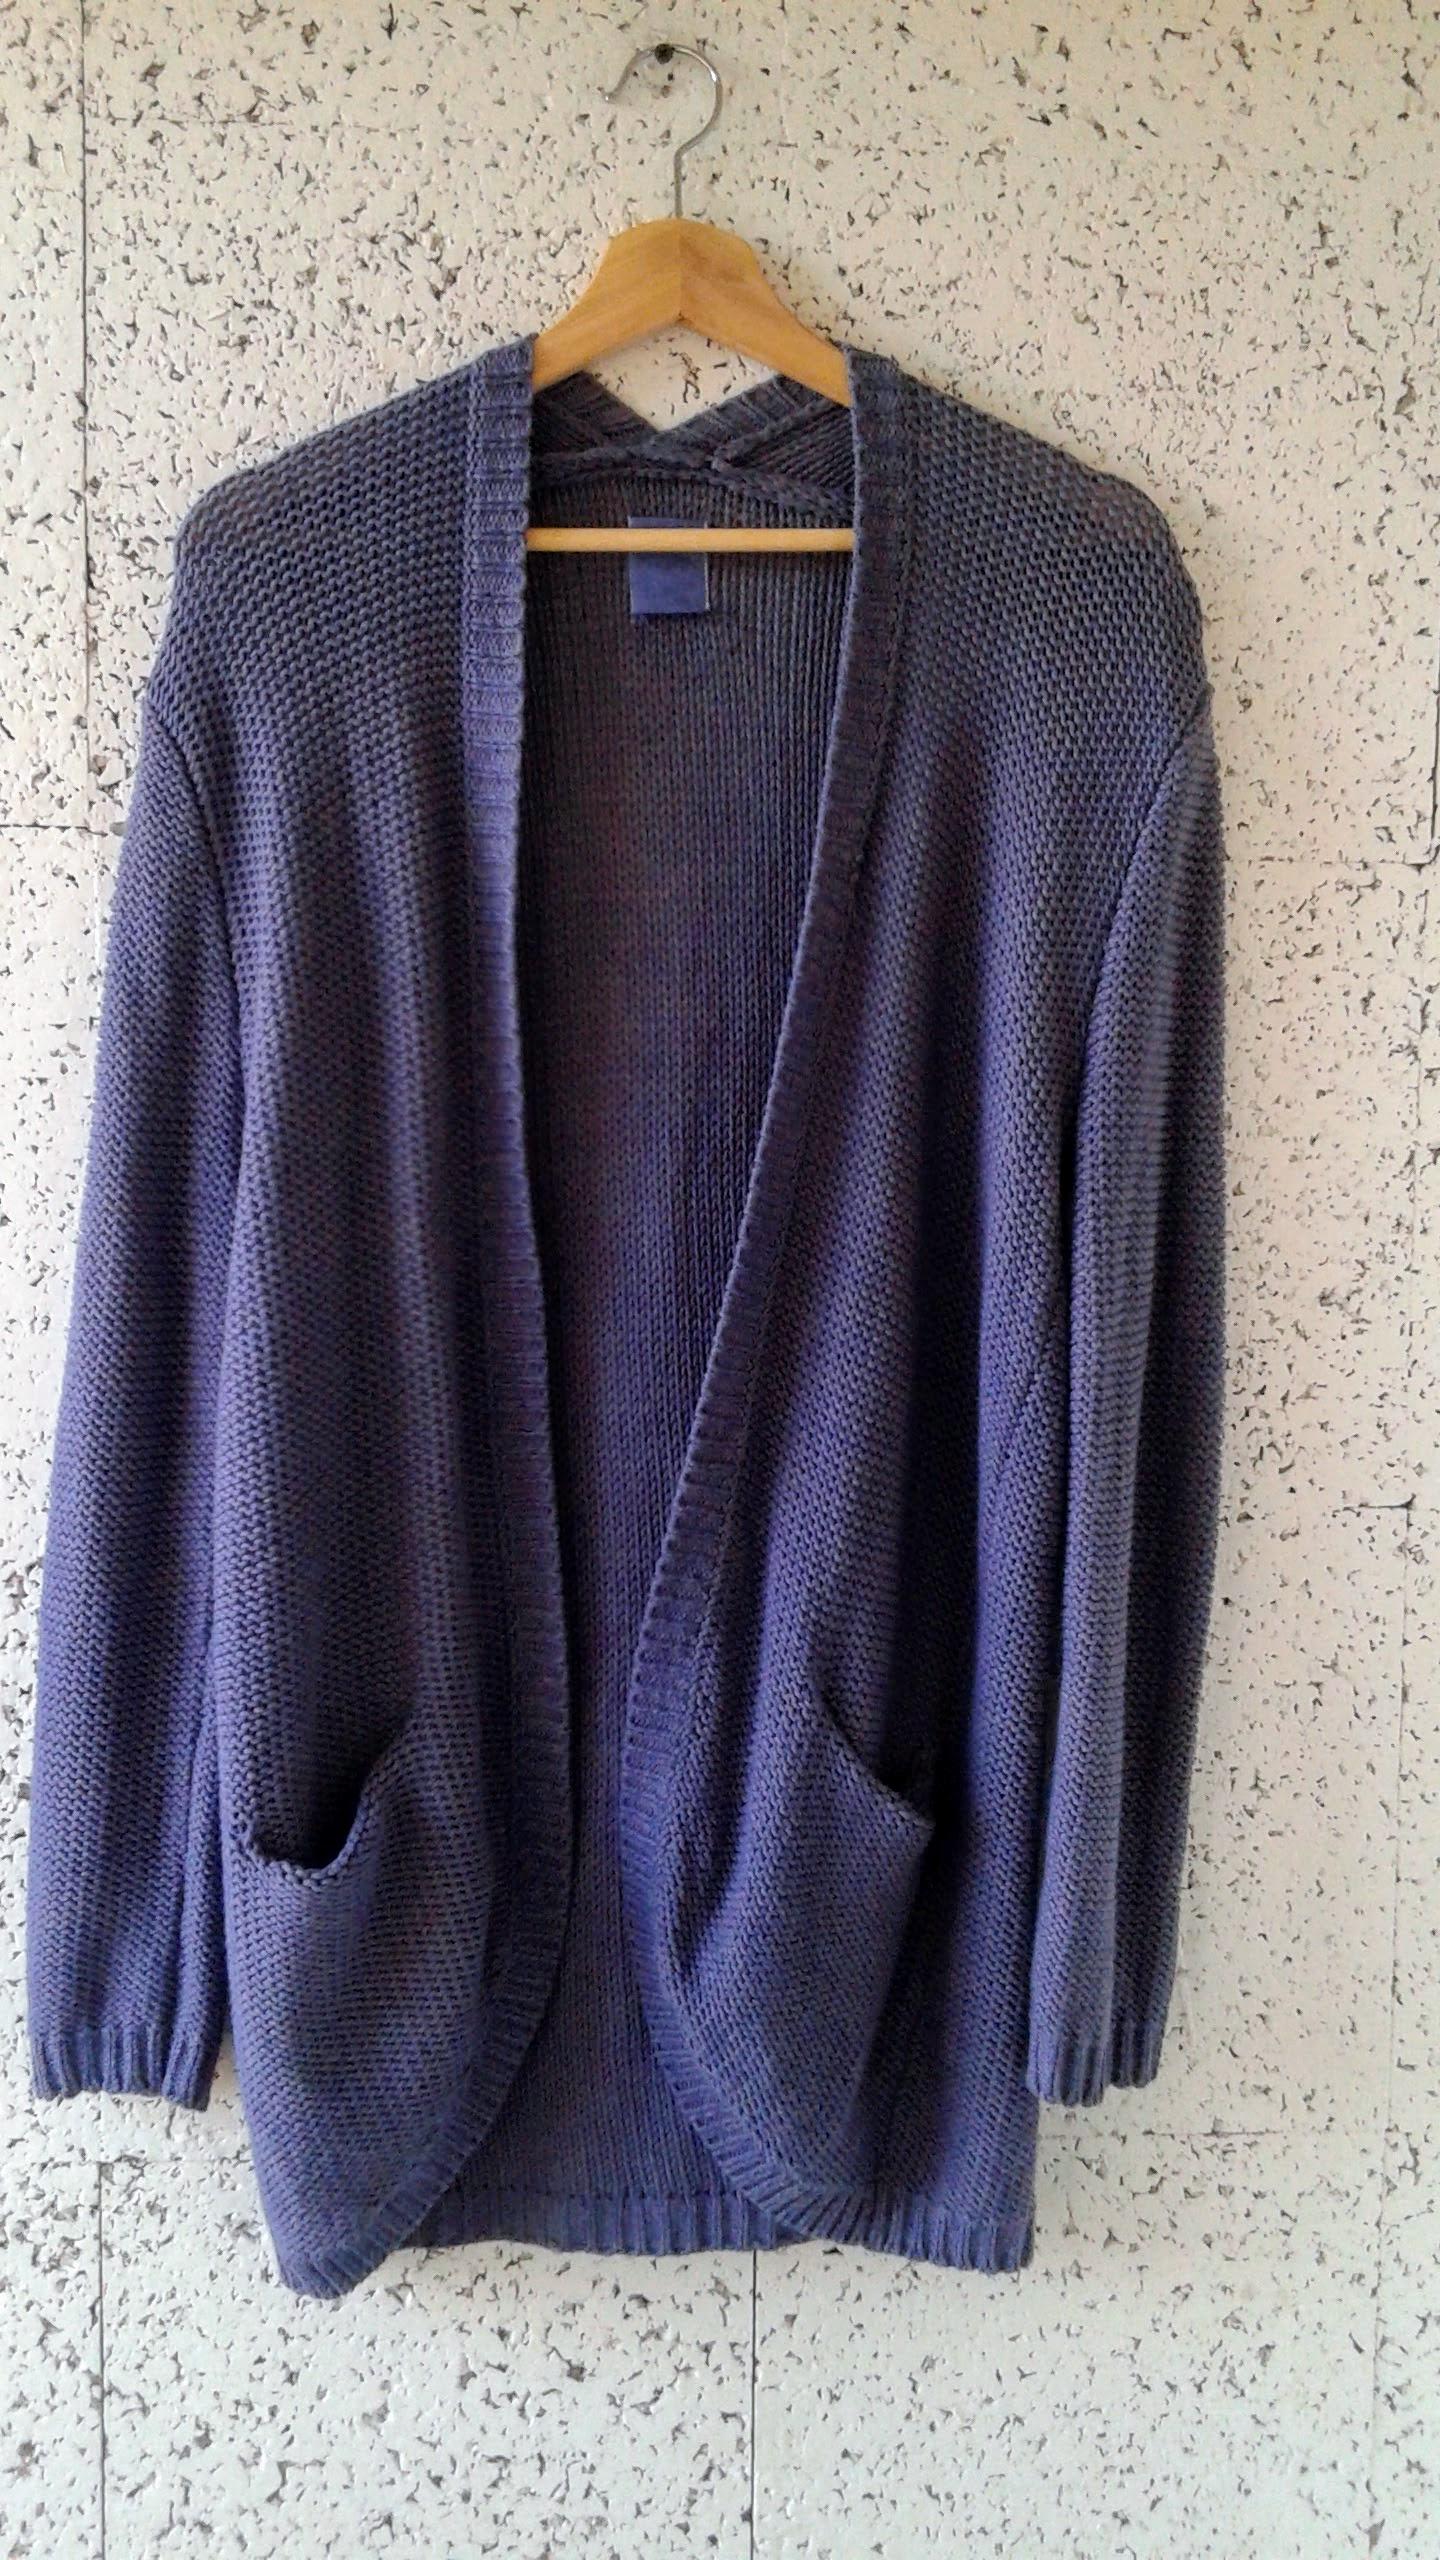 Loft 82 cardigan; Size M, $36